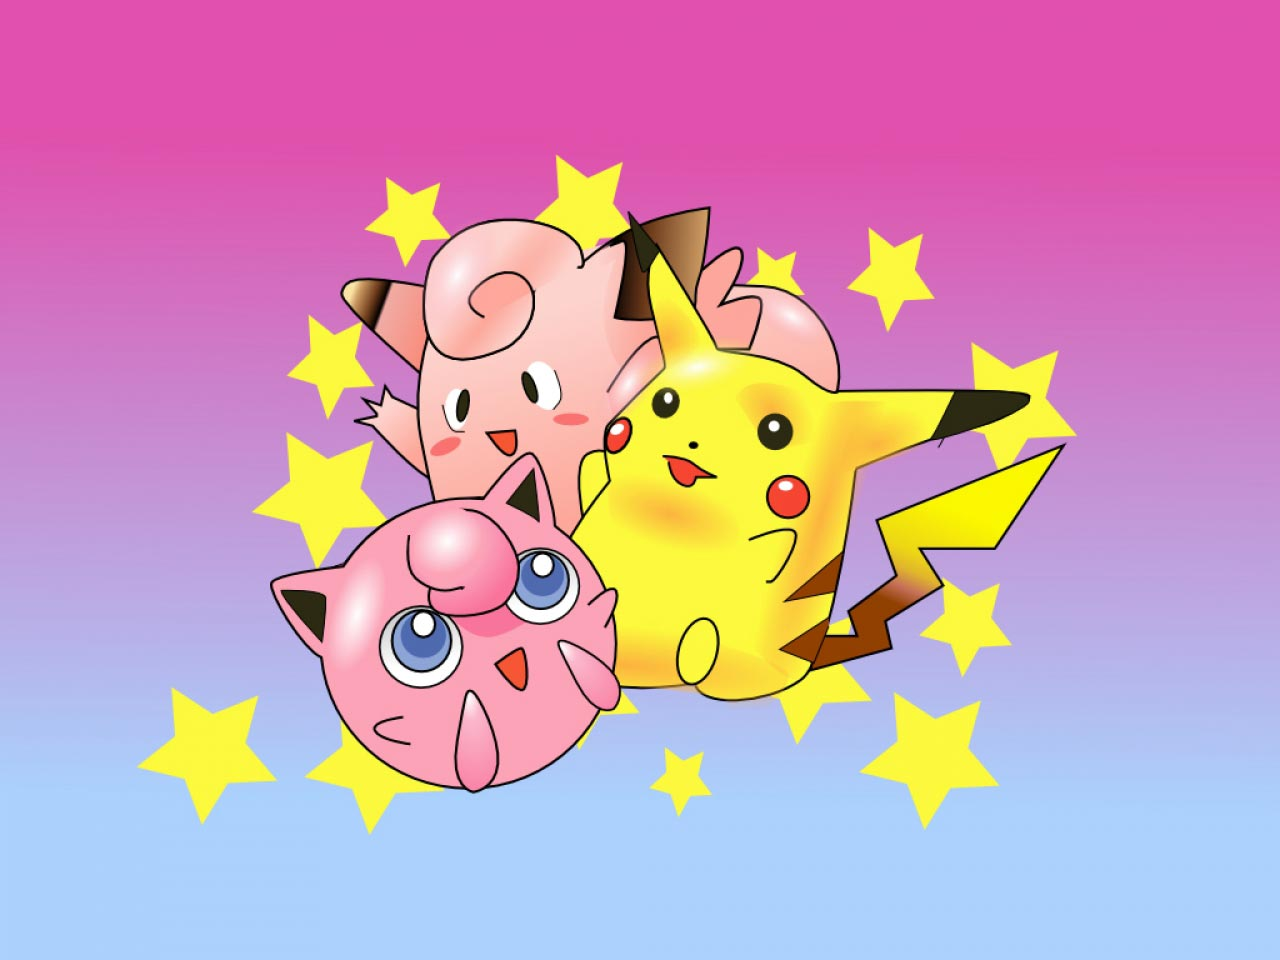 Free Download Pokemon Wallpaper Cartoon Watcher Pokemon Wallpaper